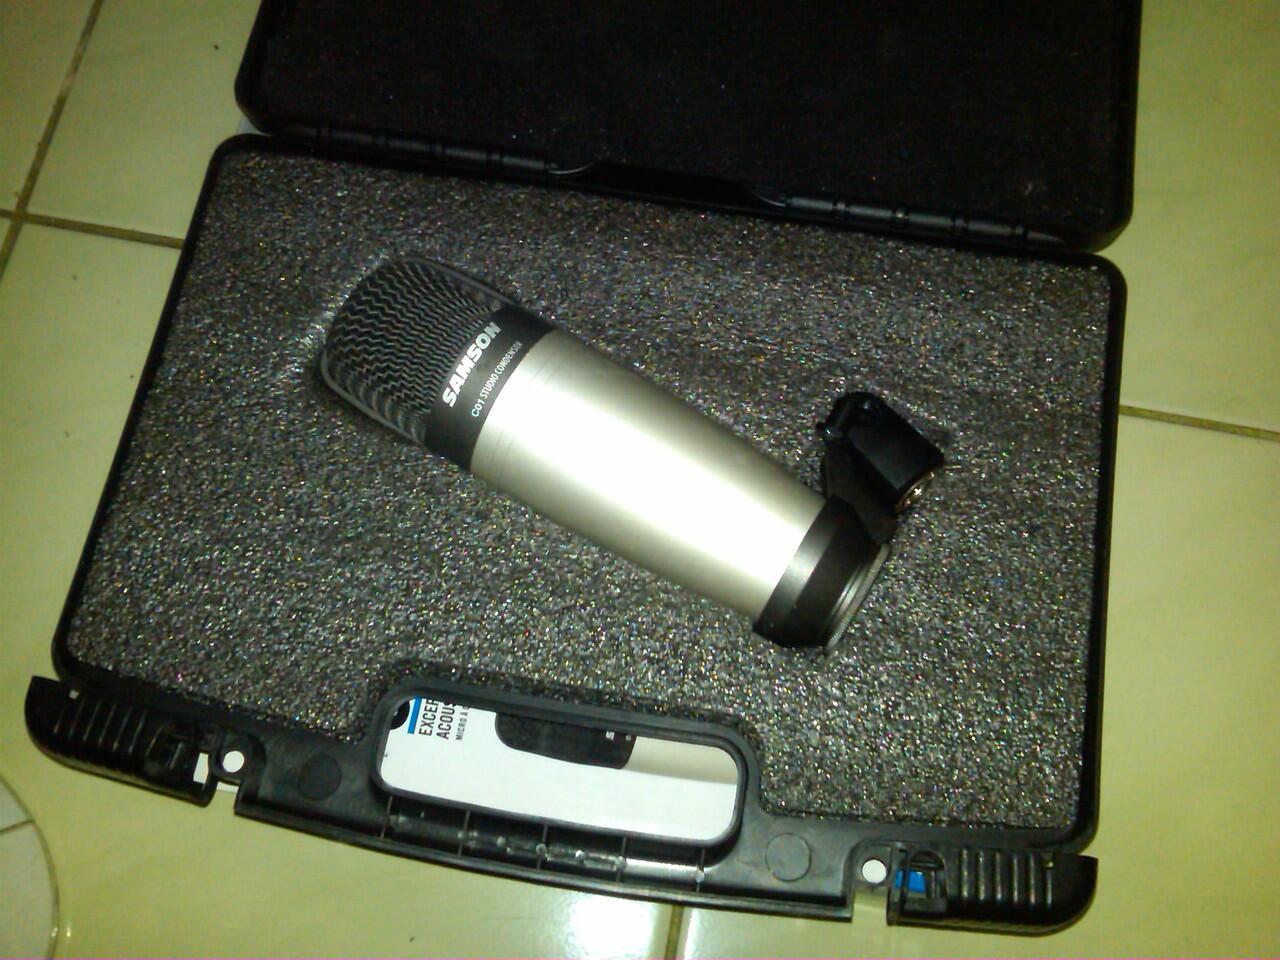 JUAL M-AUDIO KEYSTUDIO 49 + MIC CONDENSER SAMSON C01 + POP FILTER + STAND MIC + XLR